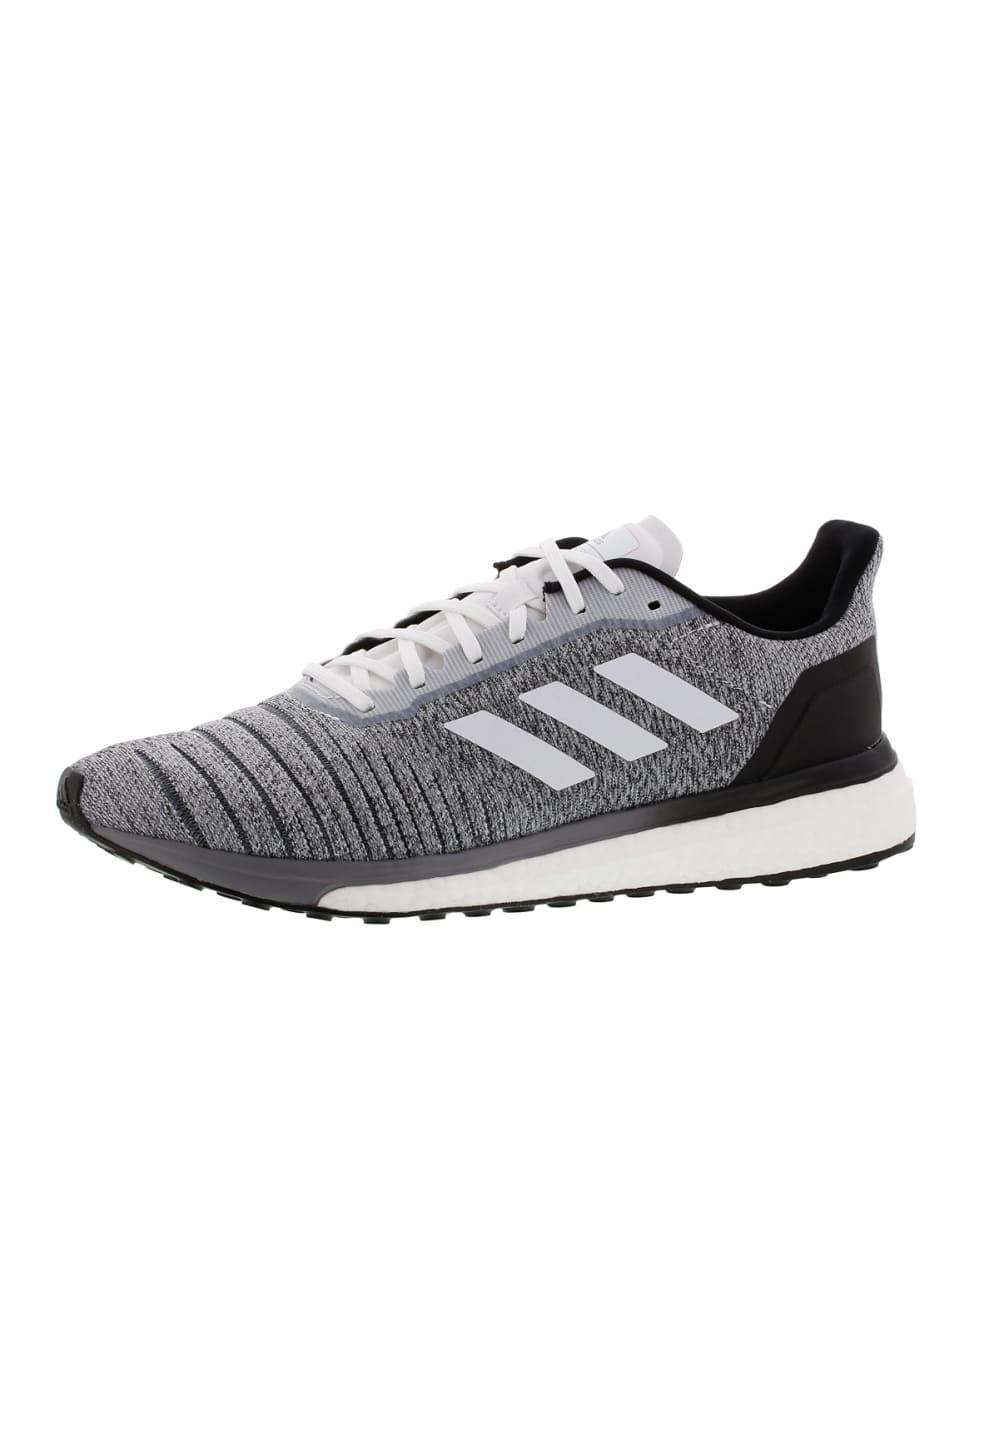 Solar Pour Drive Gris Adidas Chaussures Running Homme m8vNn0w